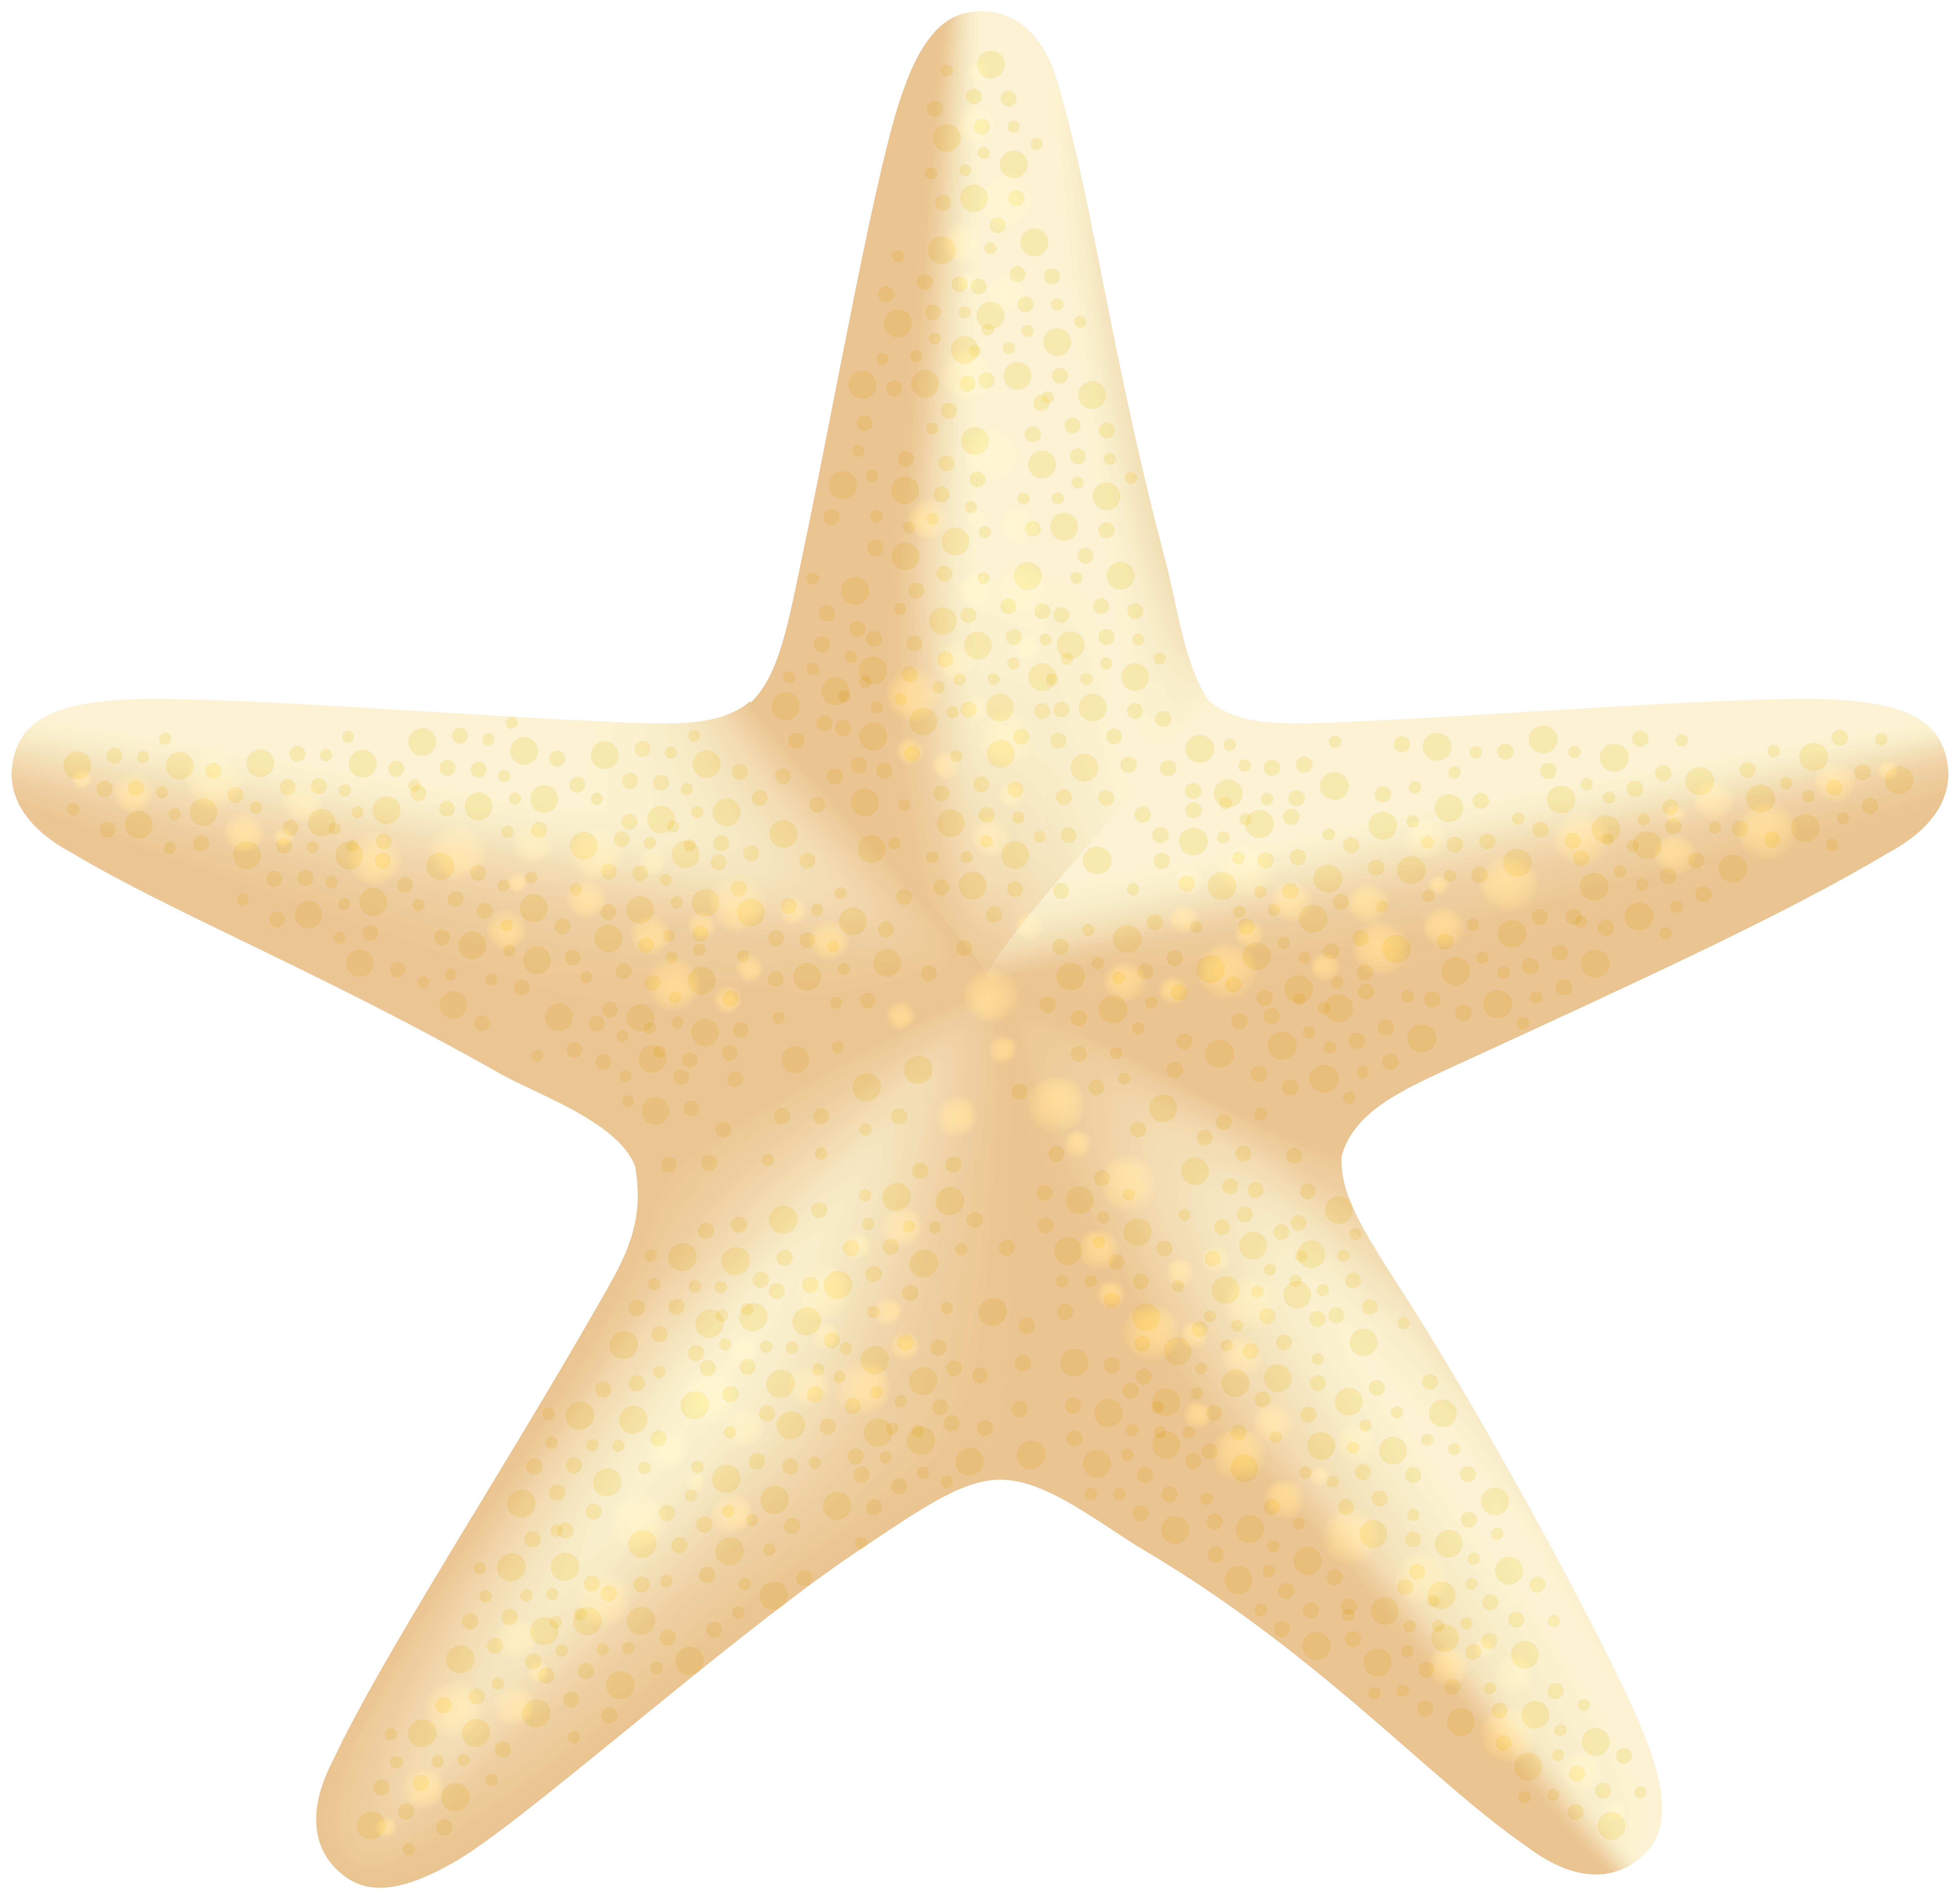 8000x7752 Sea Star Png Clip Art Imageu200b Gallery Yopriceville